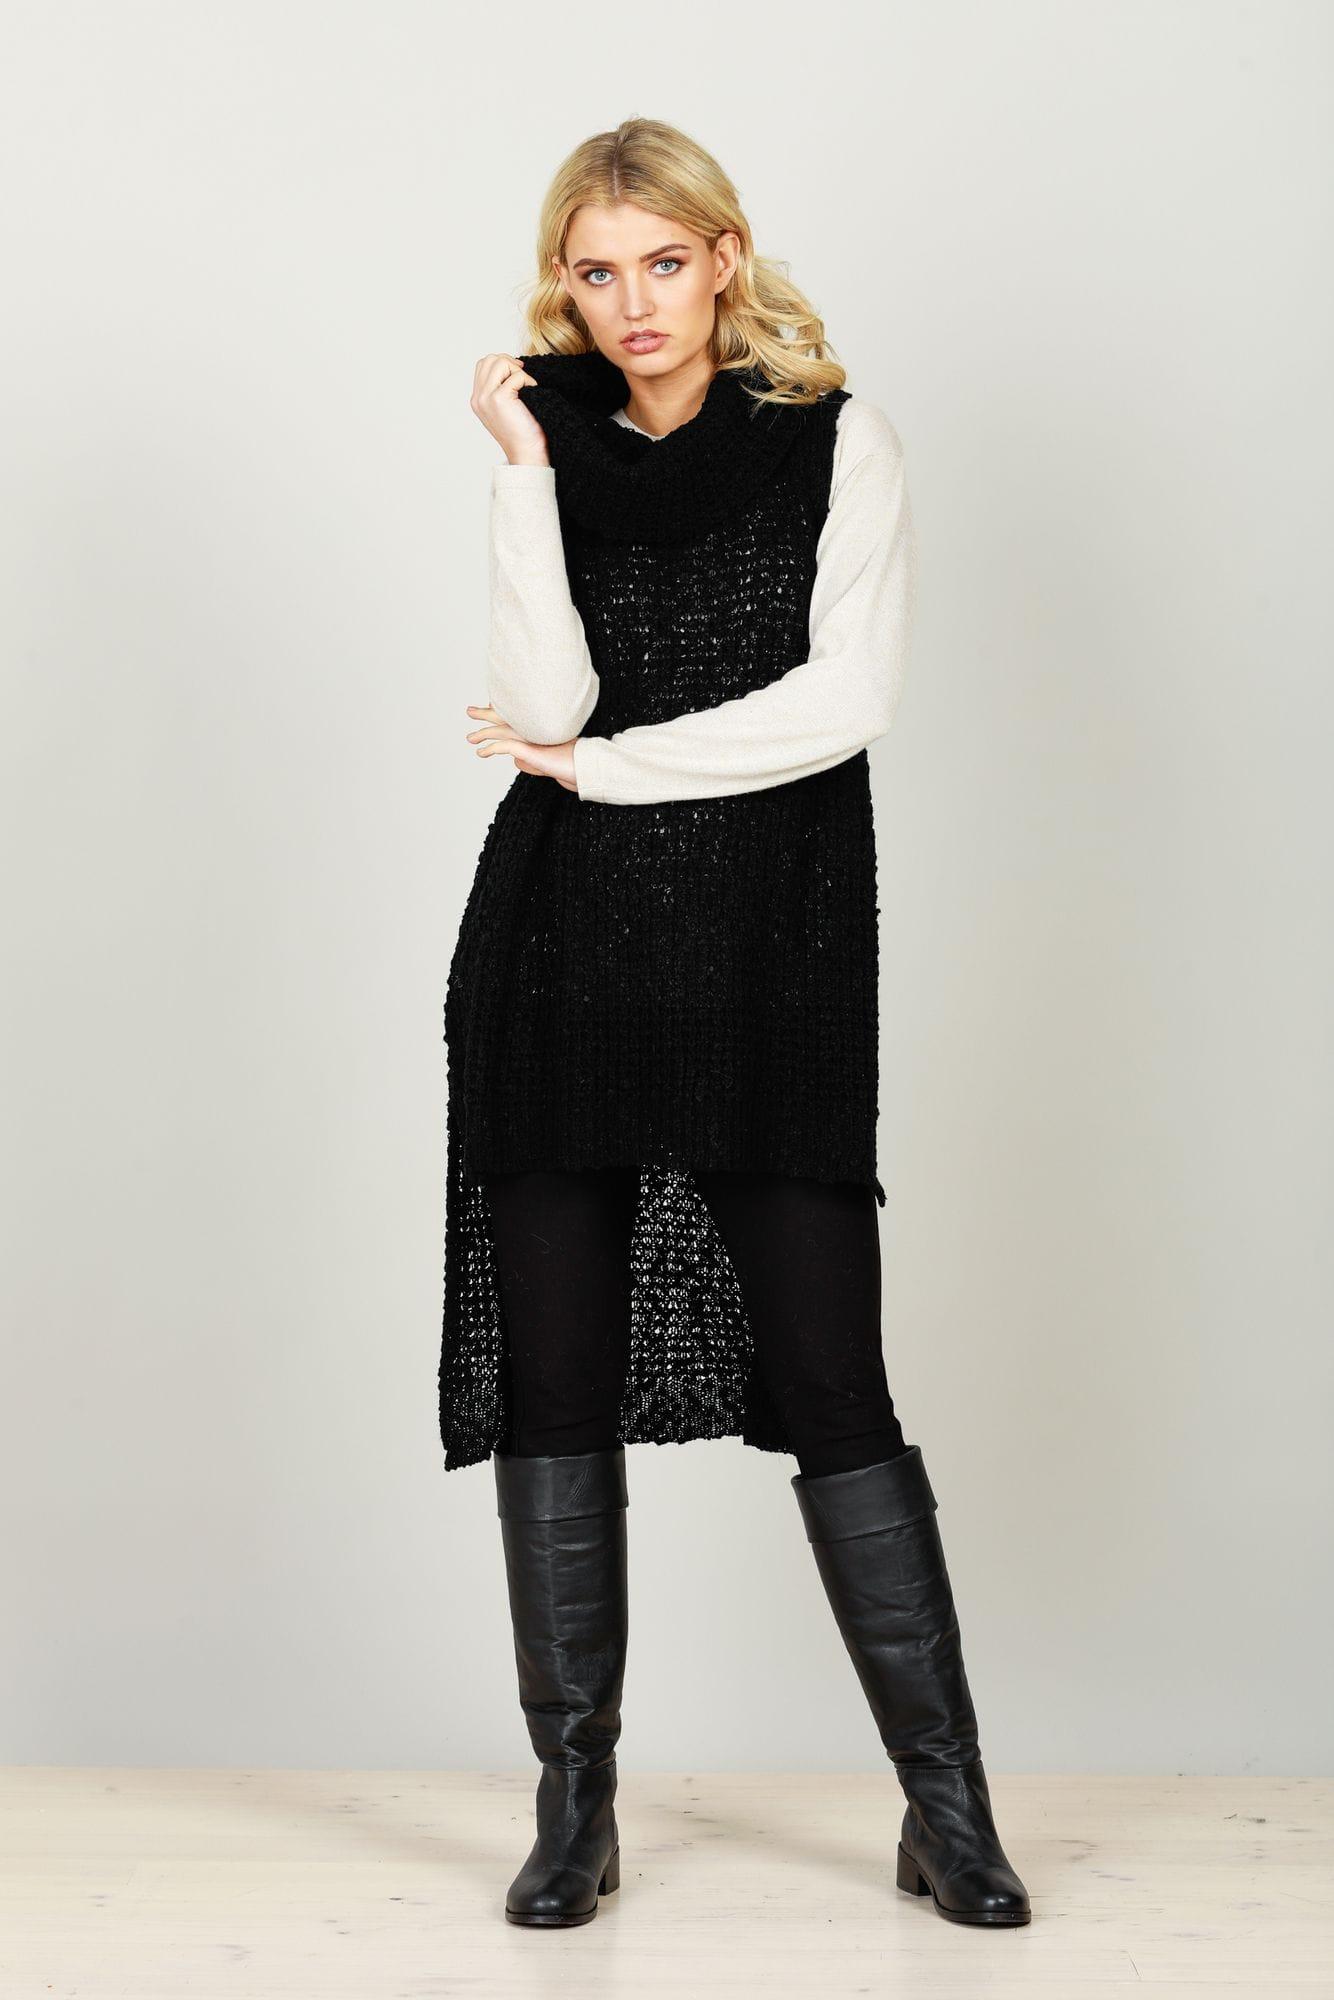 Brave + True - Bluebell knit